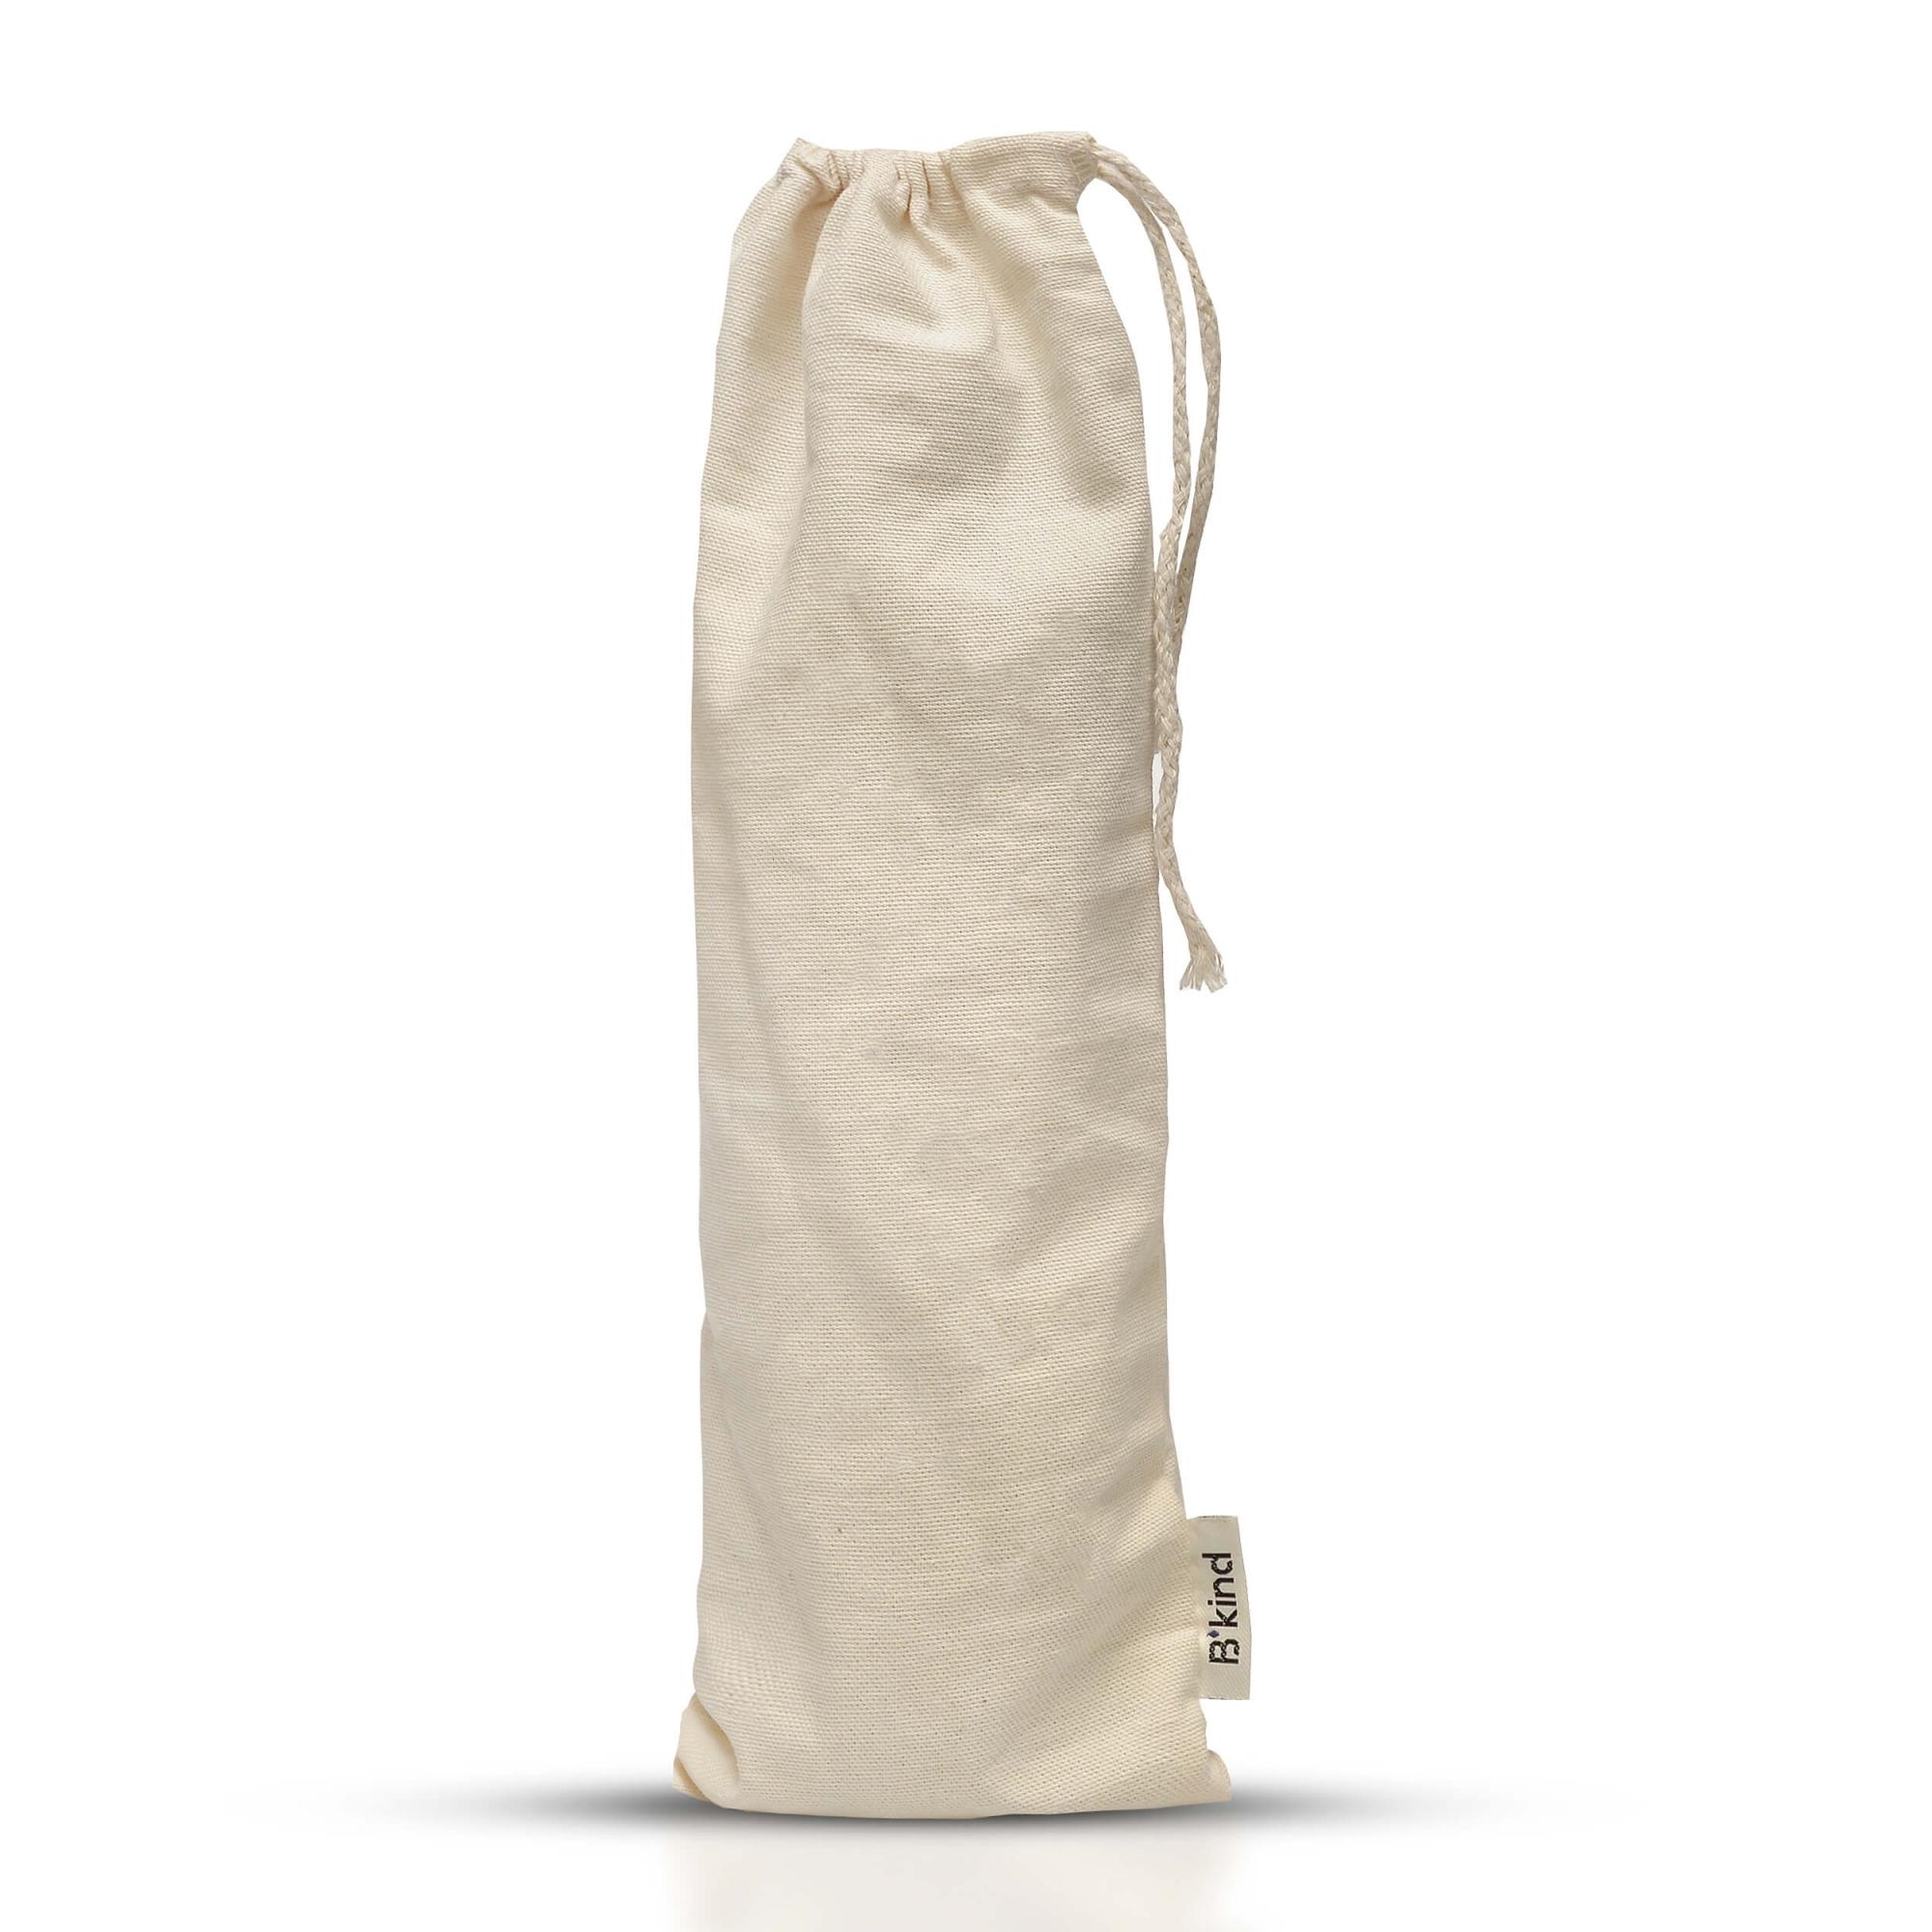 Garrafa Térmica B'kind All Silver Personalizada